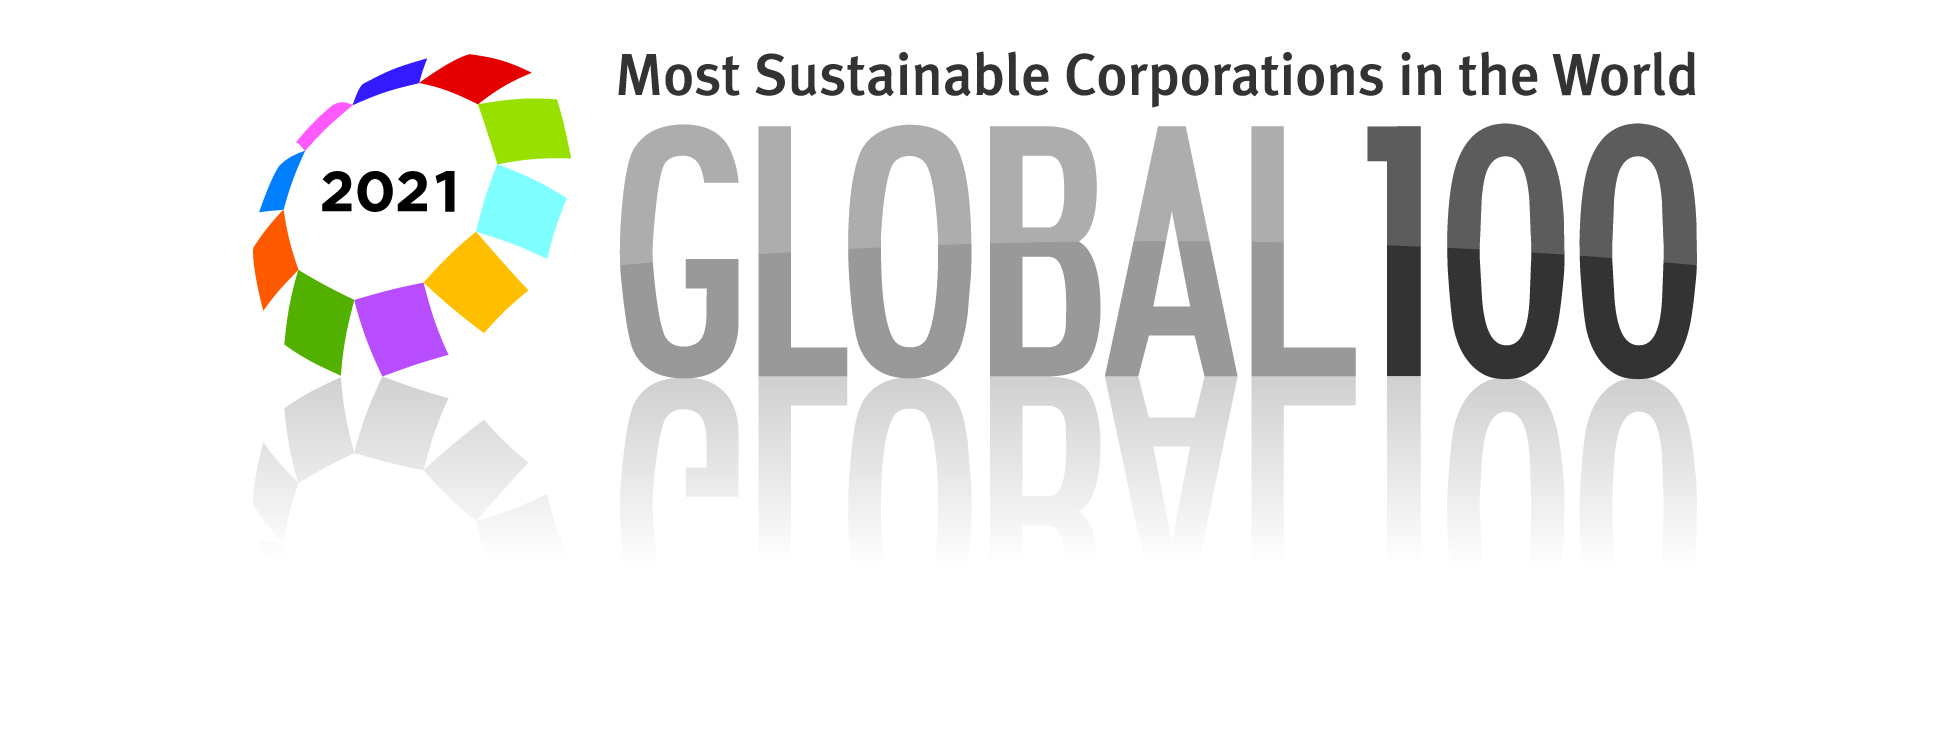 global100_2020_all_Global100-Tagline2-logo-cmyk-2021 (1).jpg